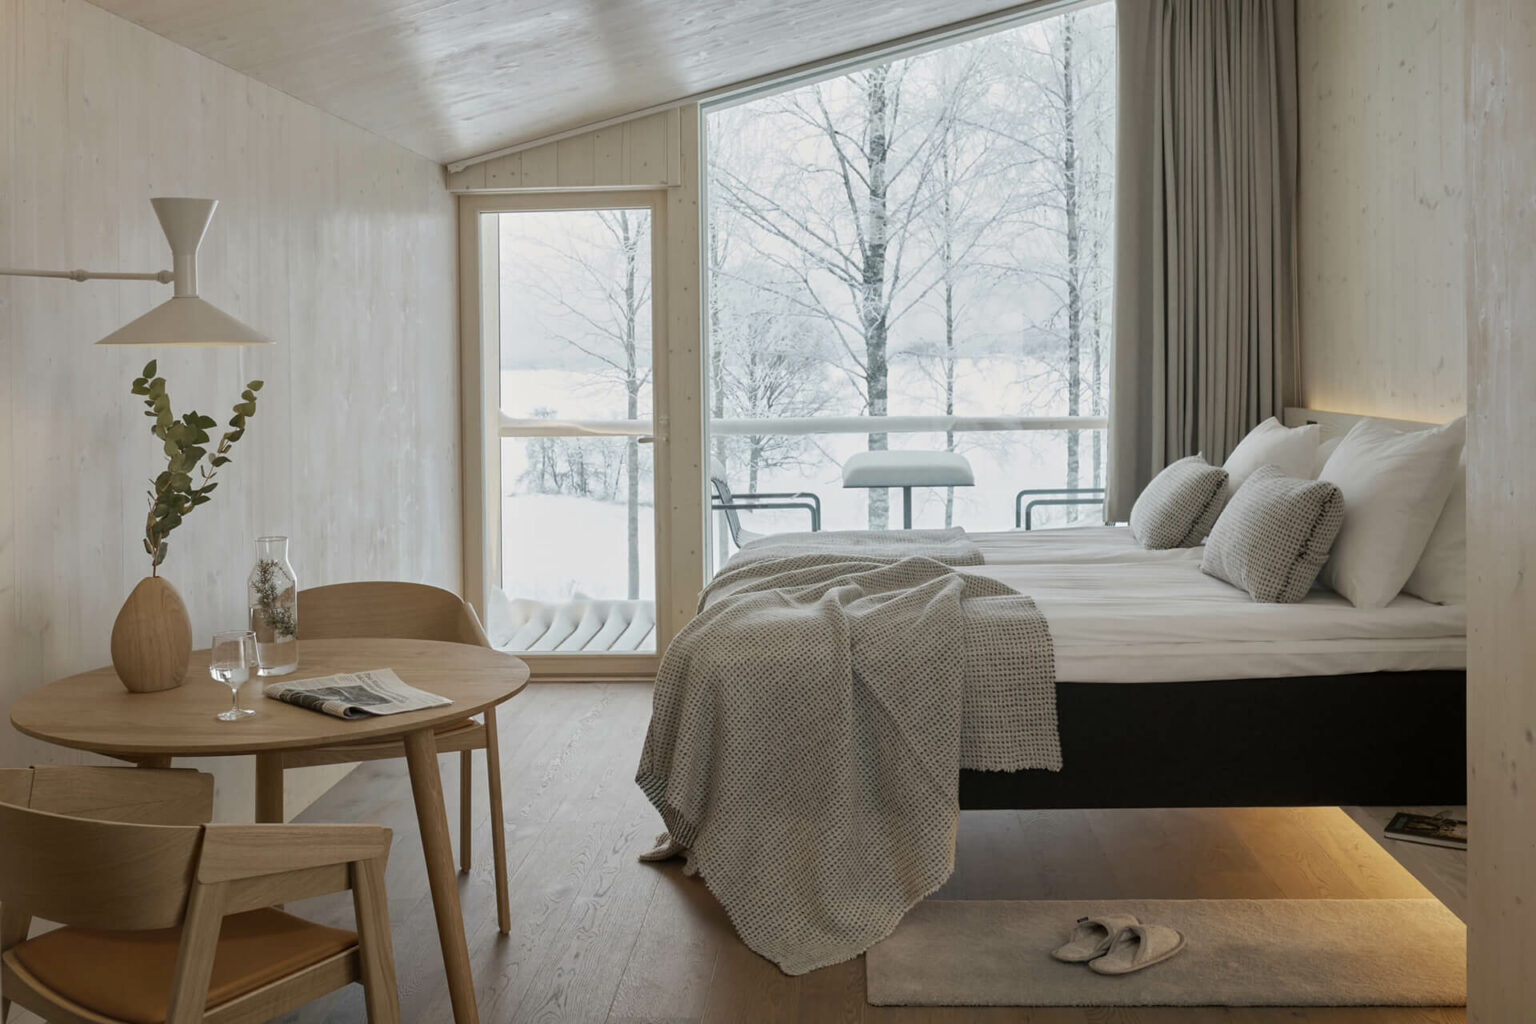 Dormitorio / Riikka Kantinkoski|Uni Resorts